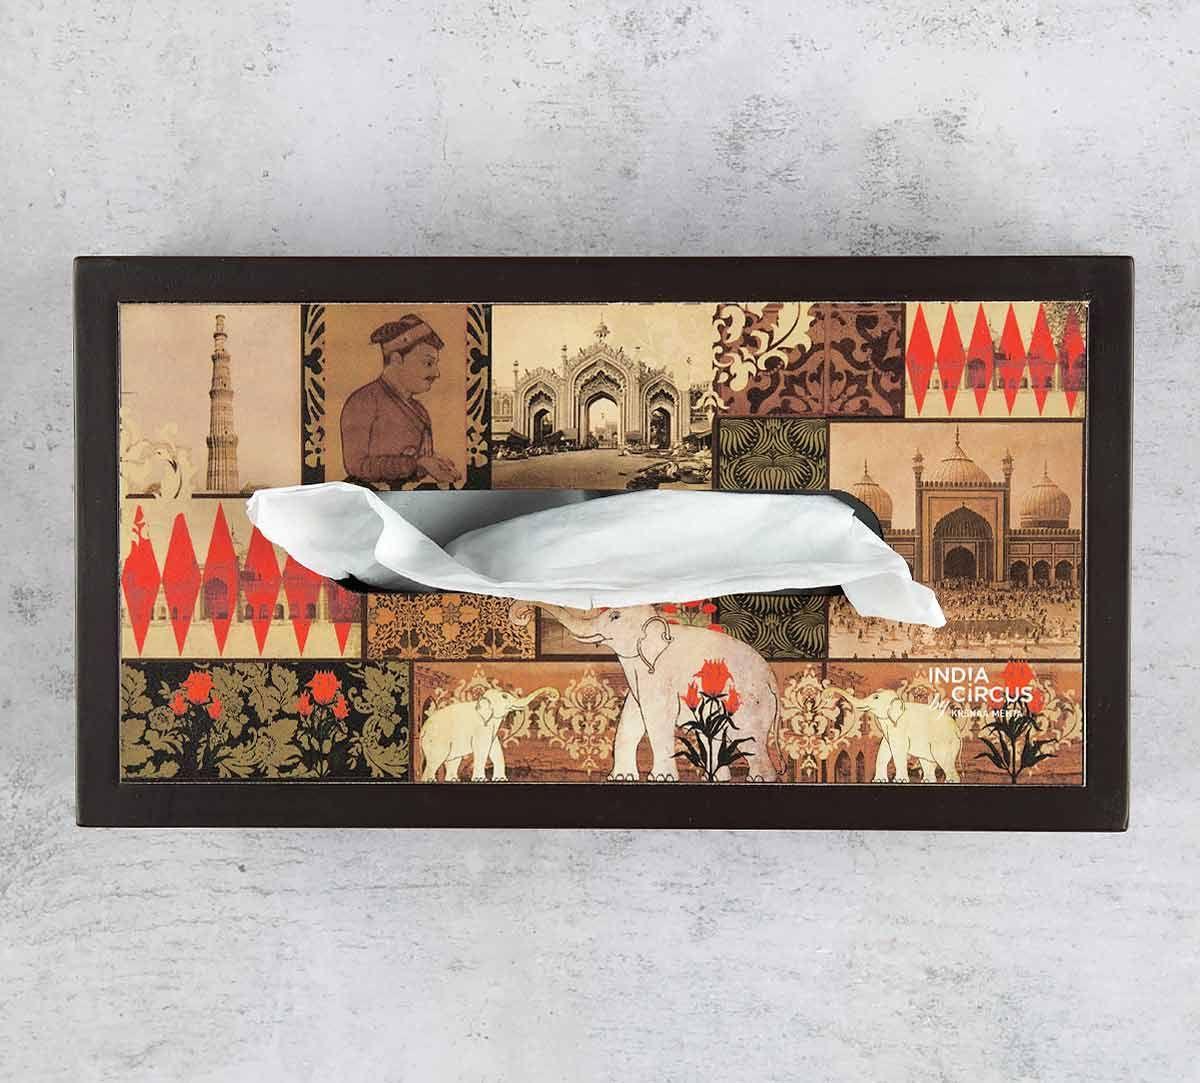 India Circus The Mughal Era MDF Tissue Box Holder